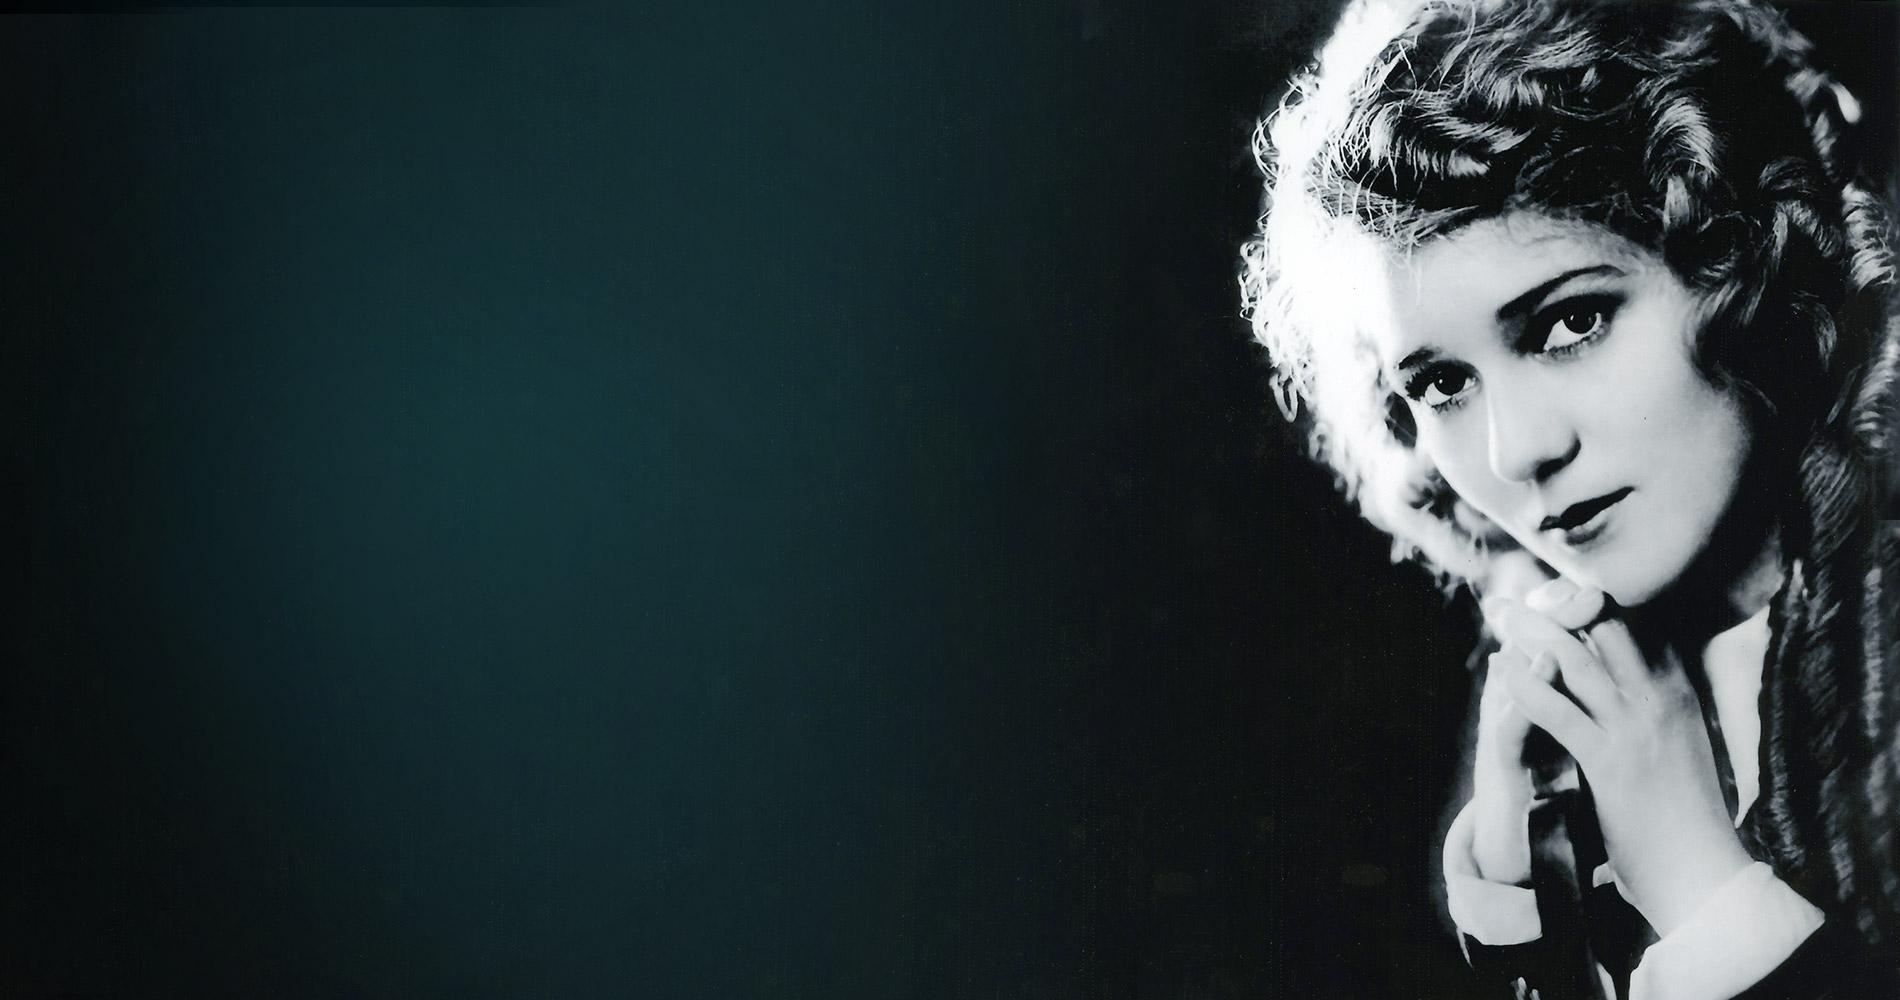 mary-pickford-foundation-silent-film-screenings-events-bio-info